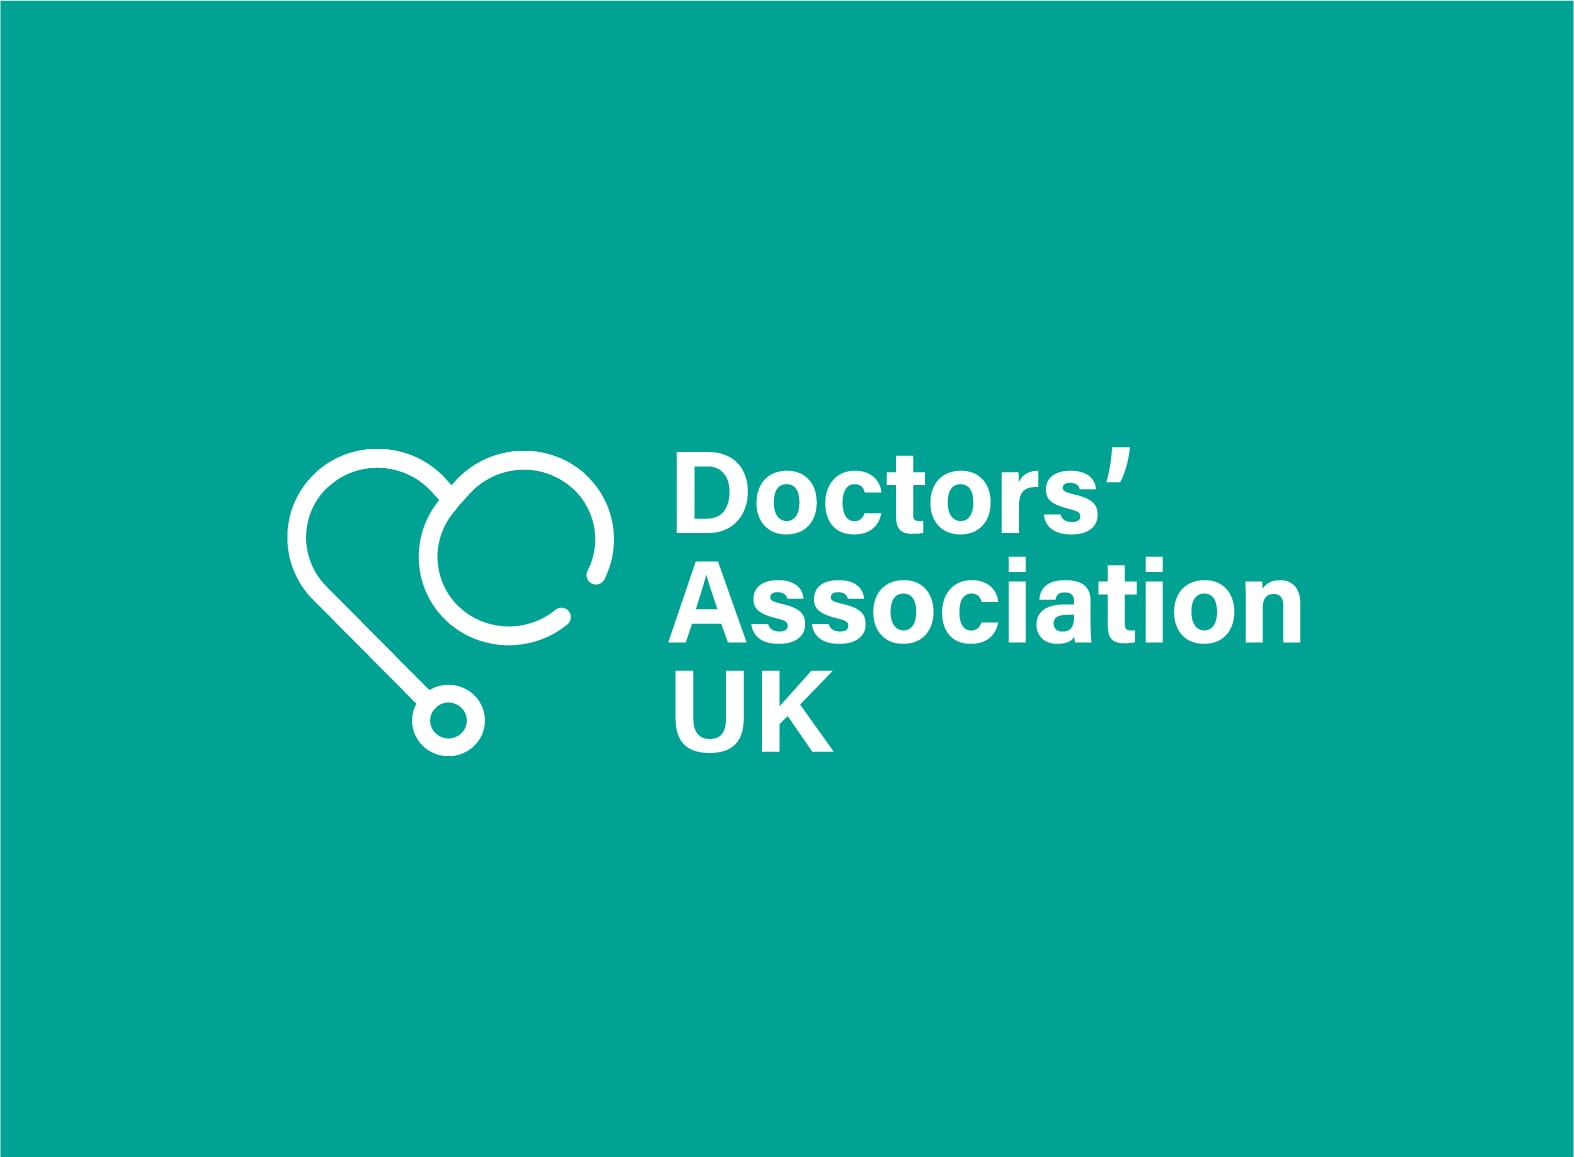 Doctors' Association UK logo